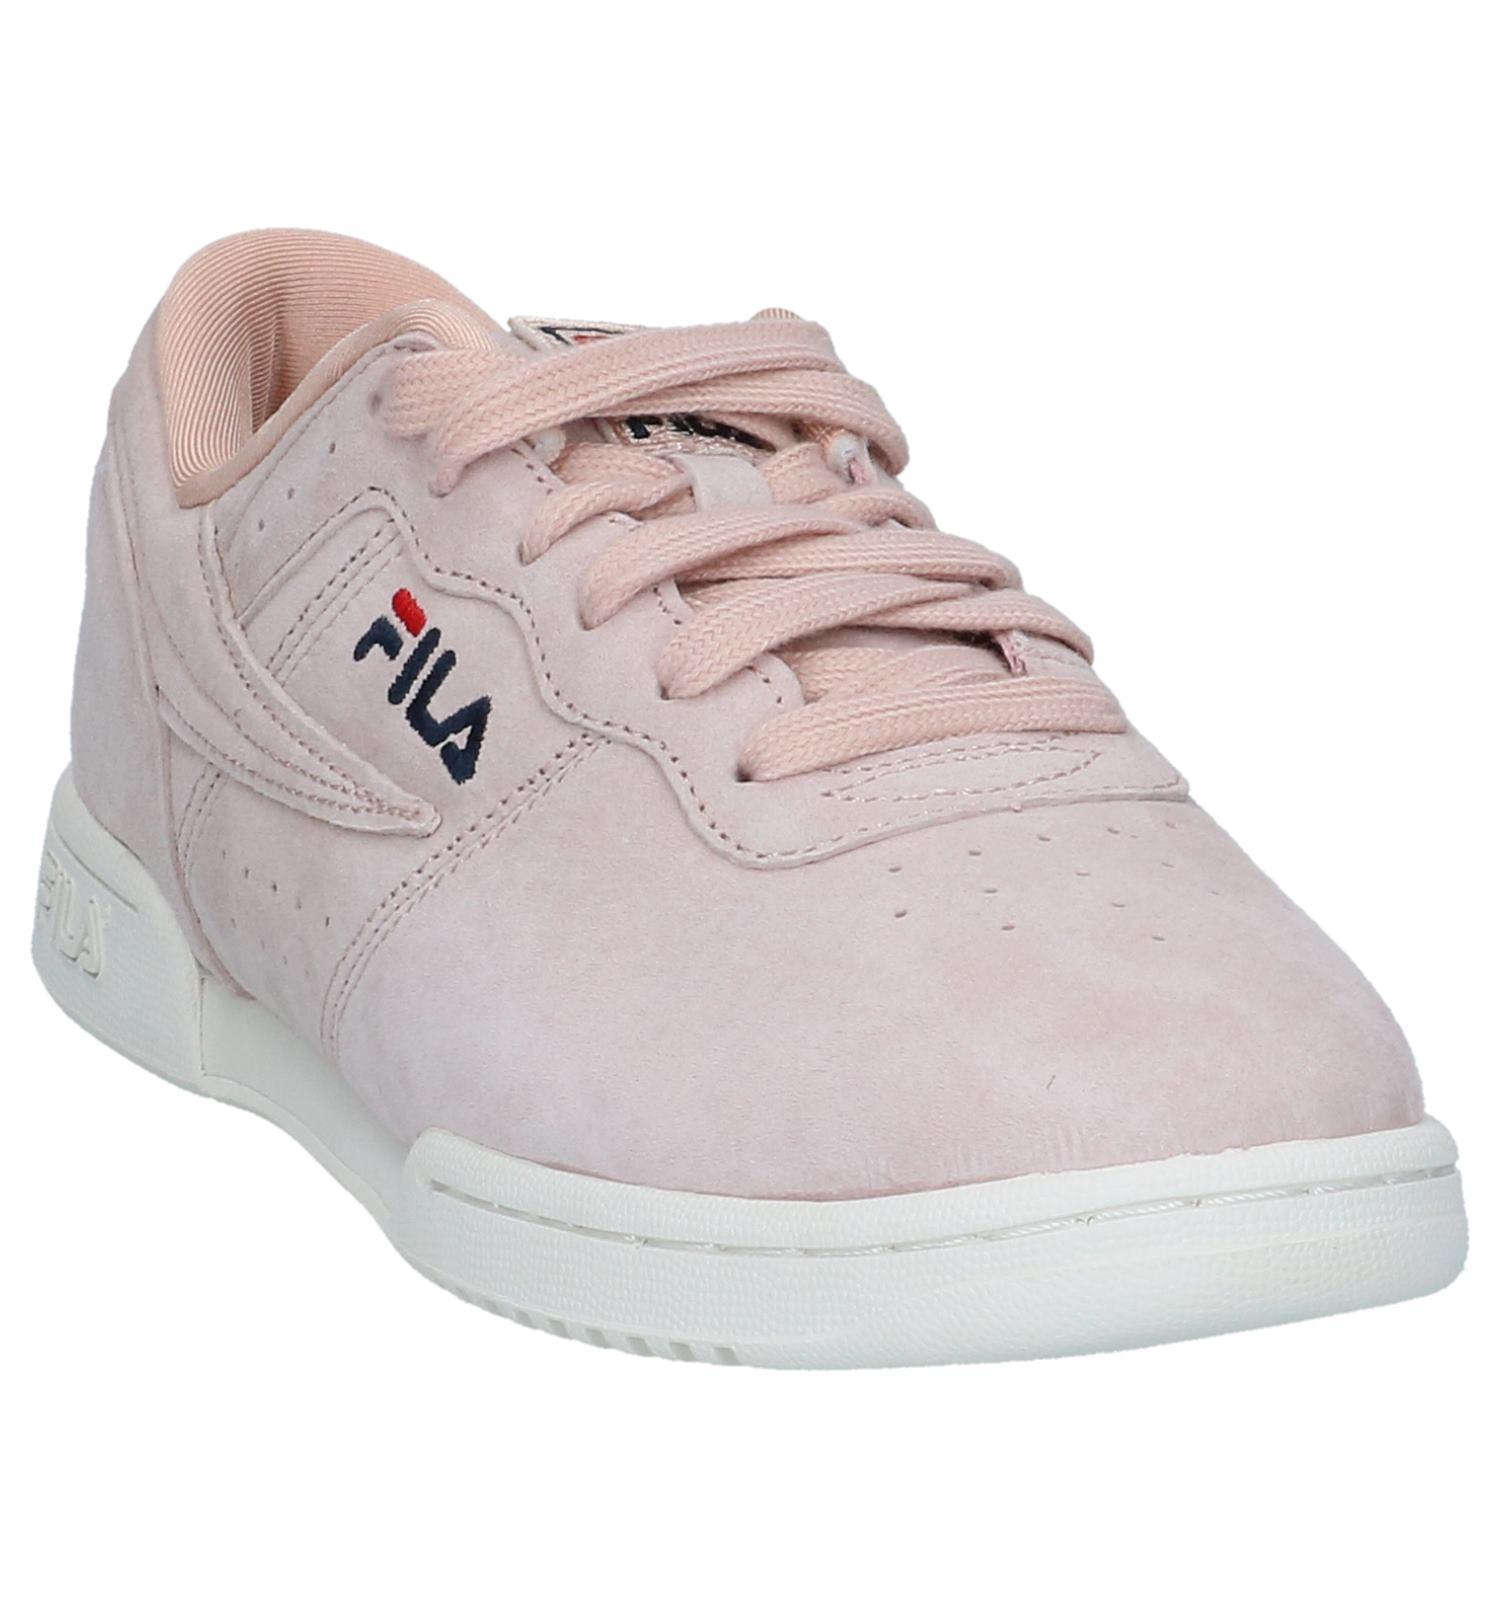 Fila Licht Roze Original Sneakers Fitness htsrQCd